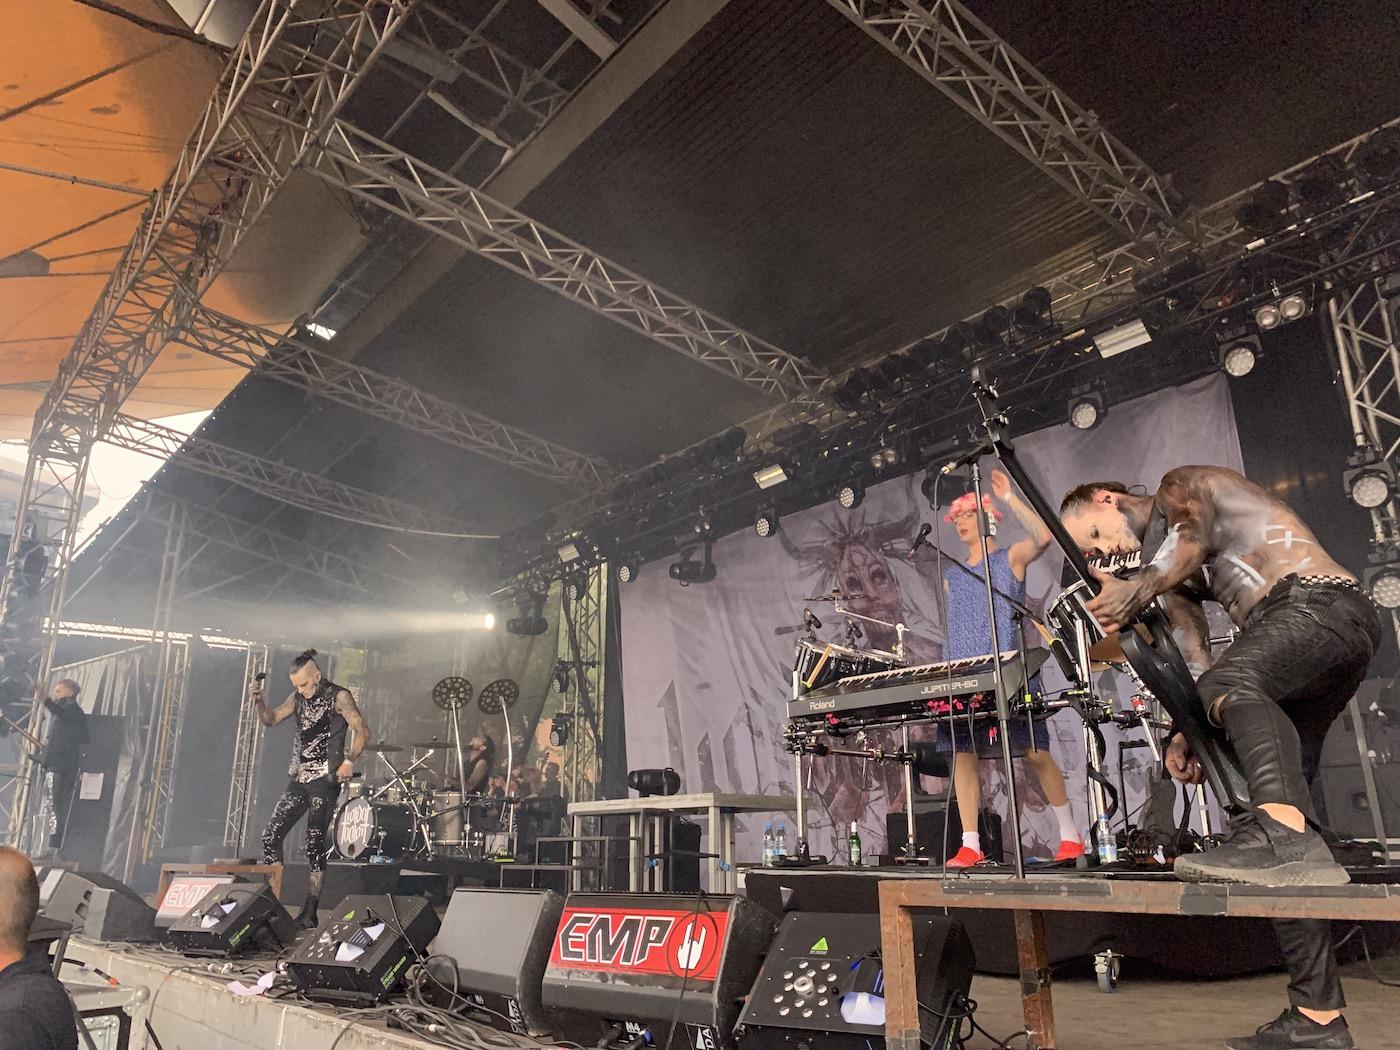 mark_benecke_amphi_festival_koeln_2019 - 69.jpg